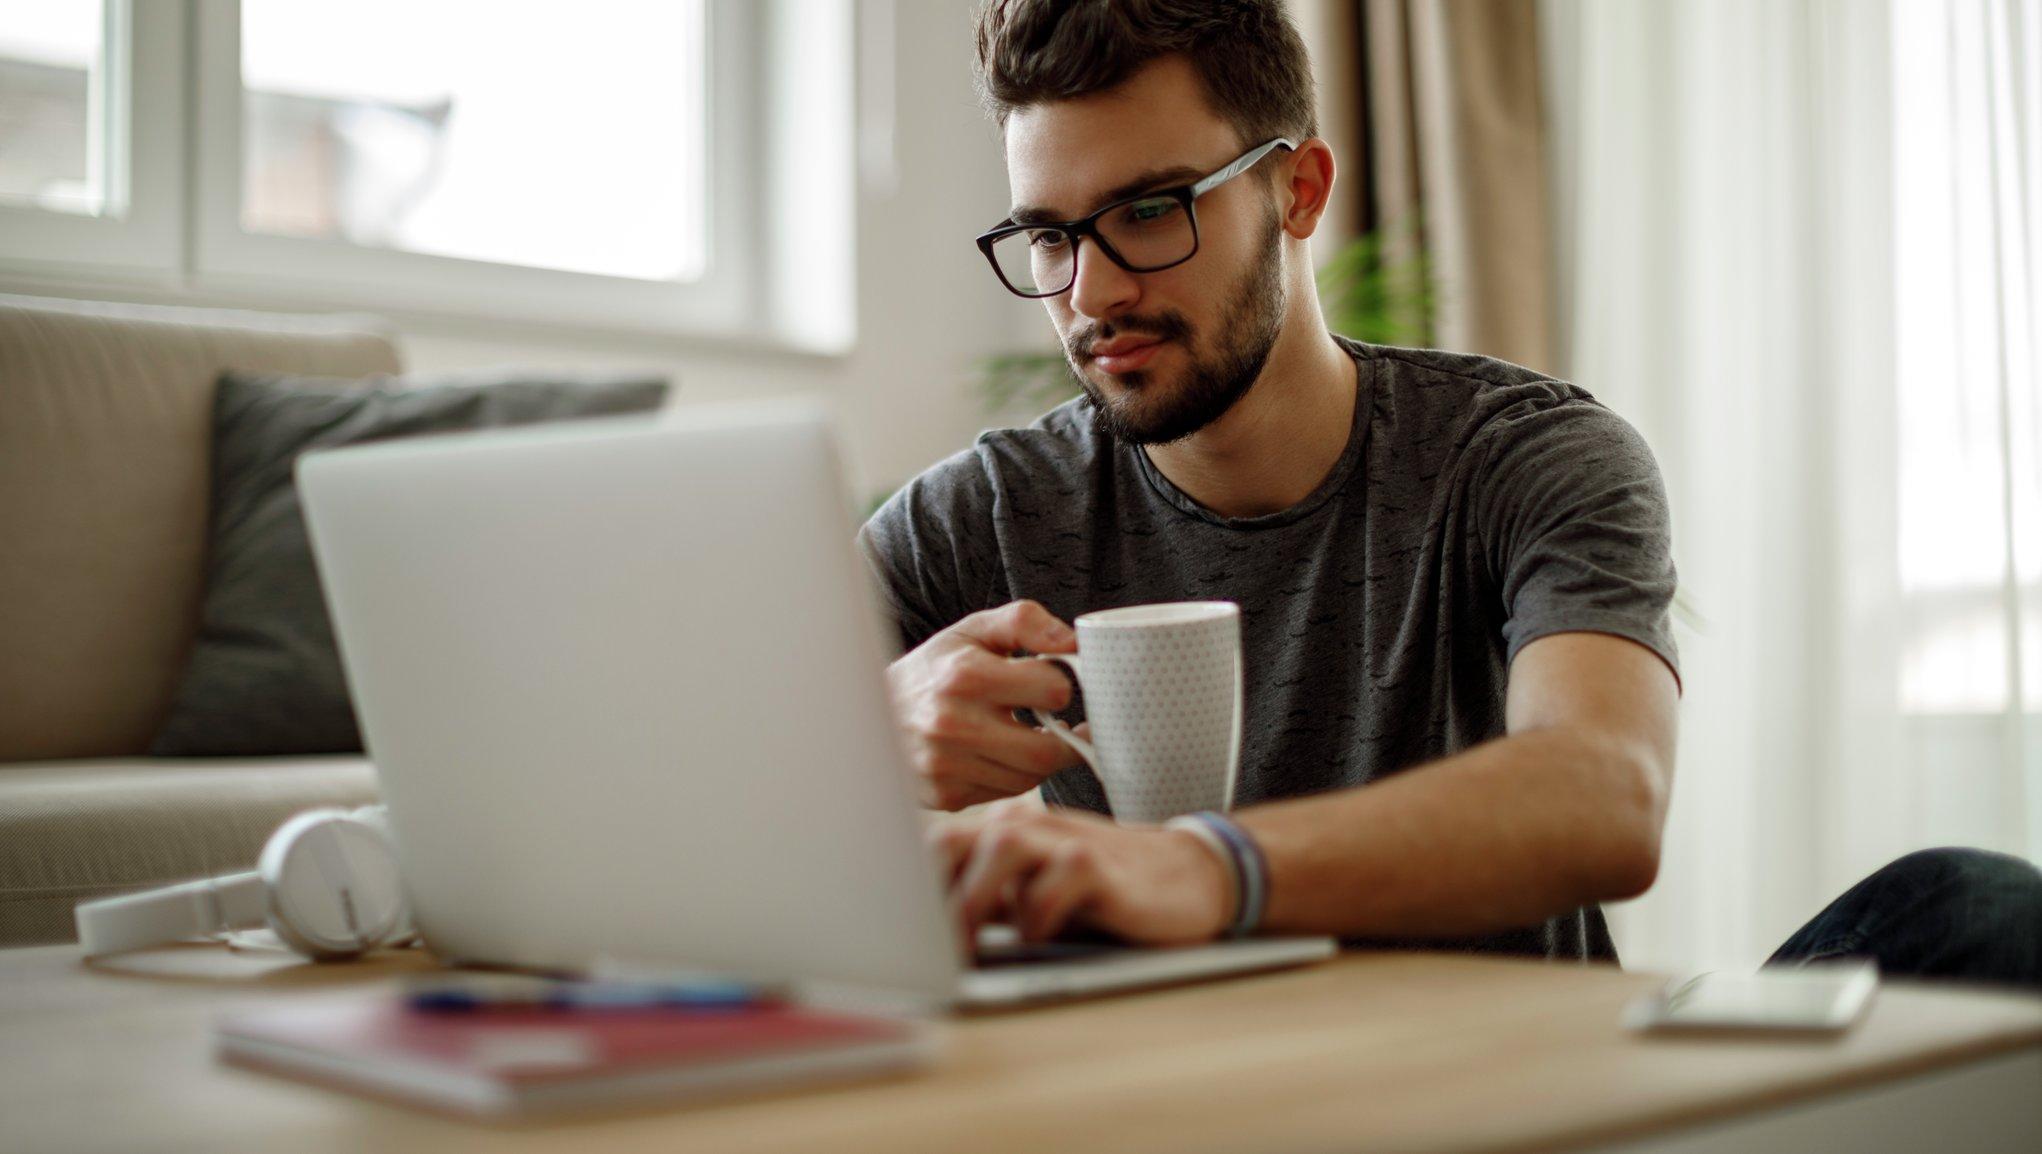 En man jobbar vid datorn